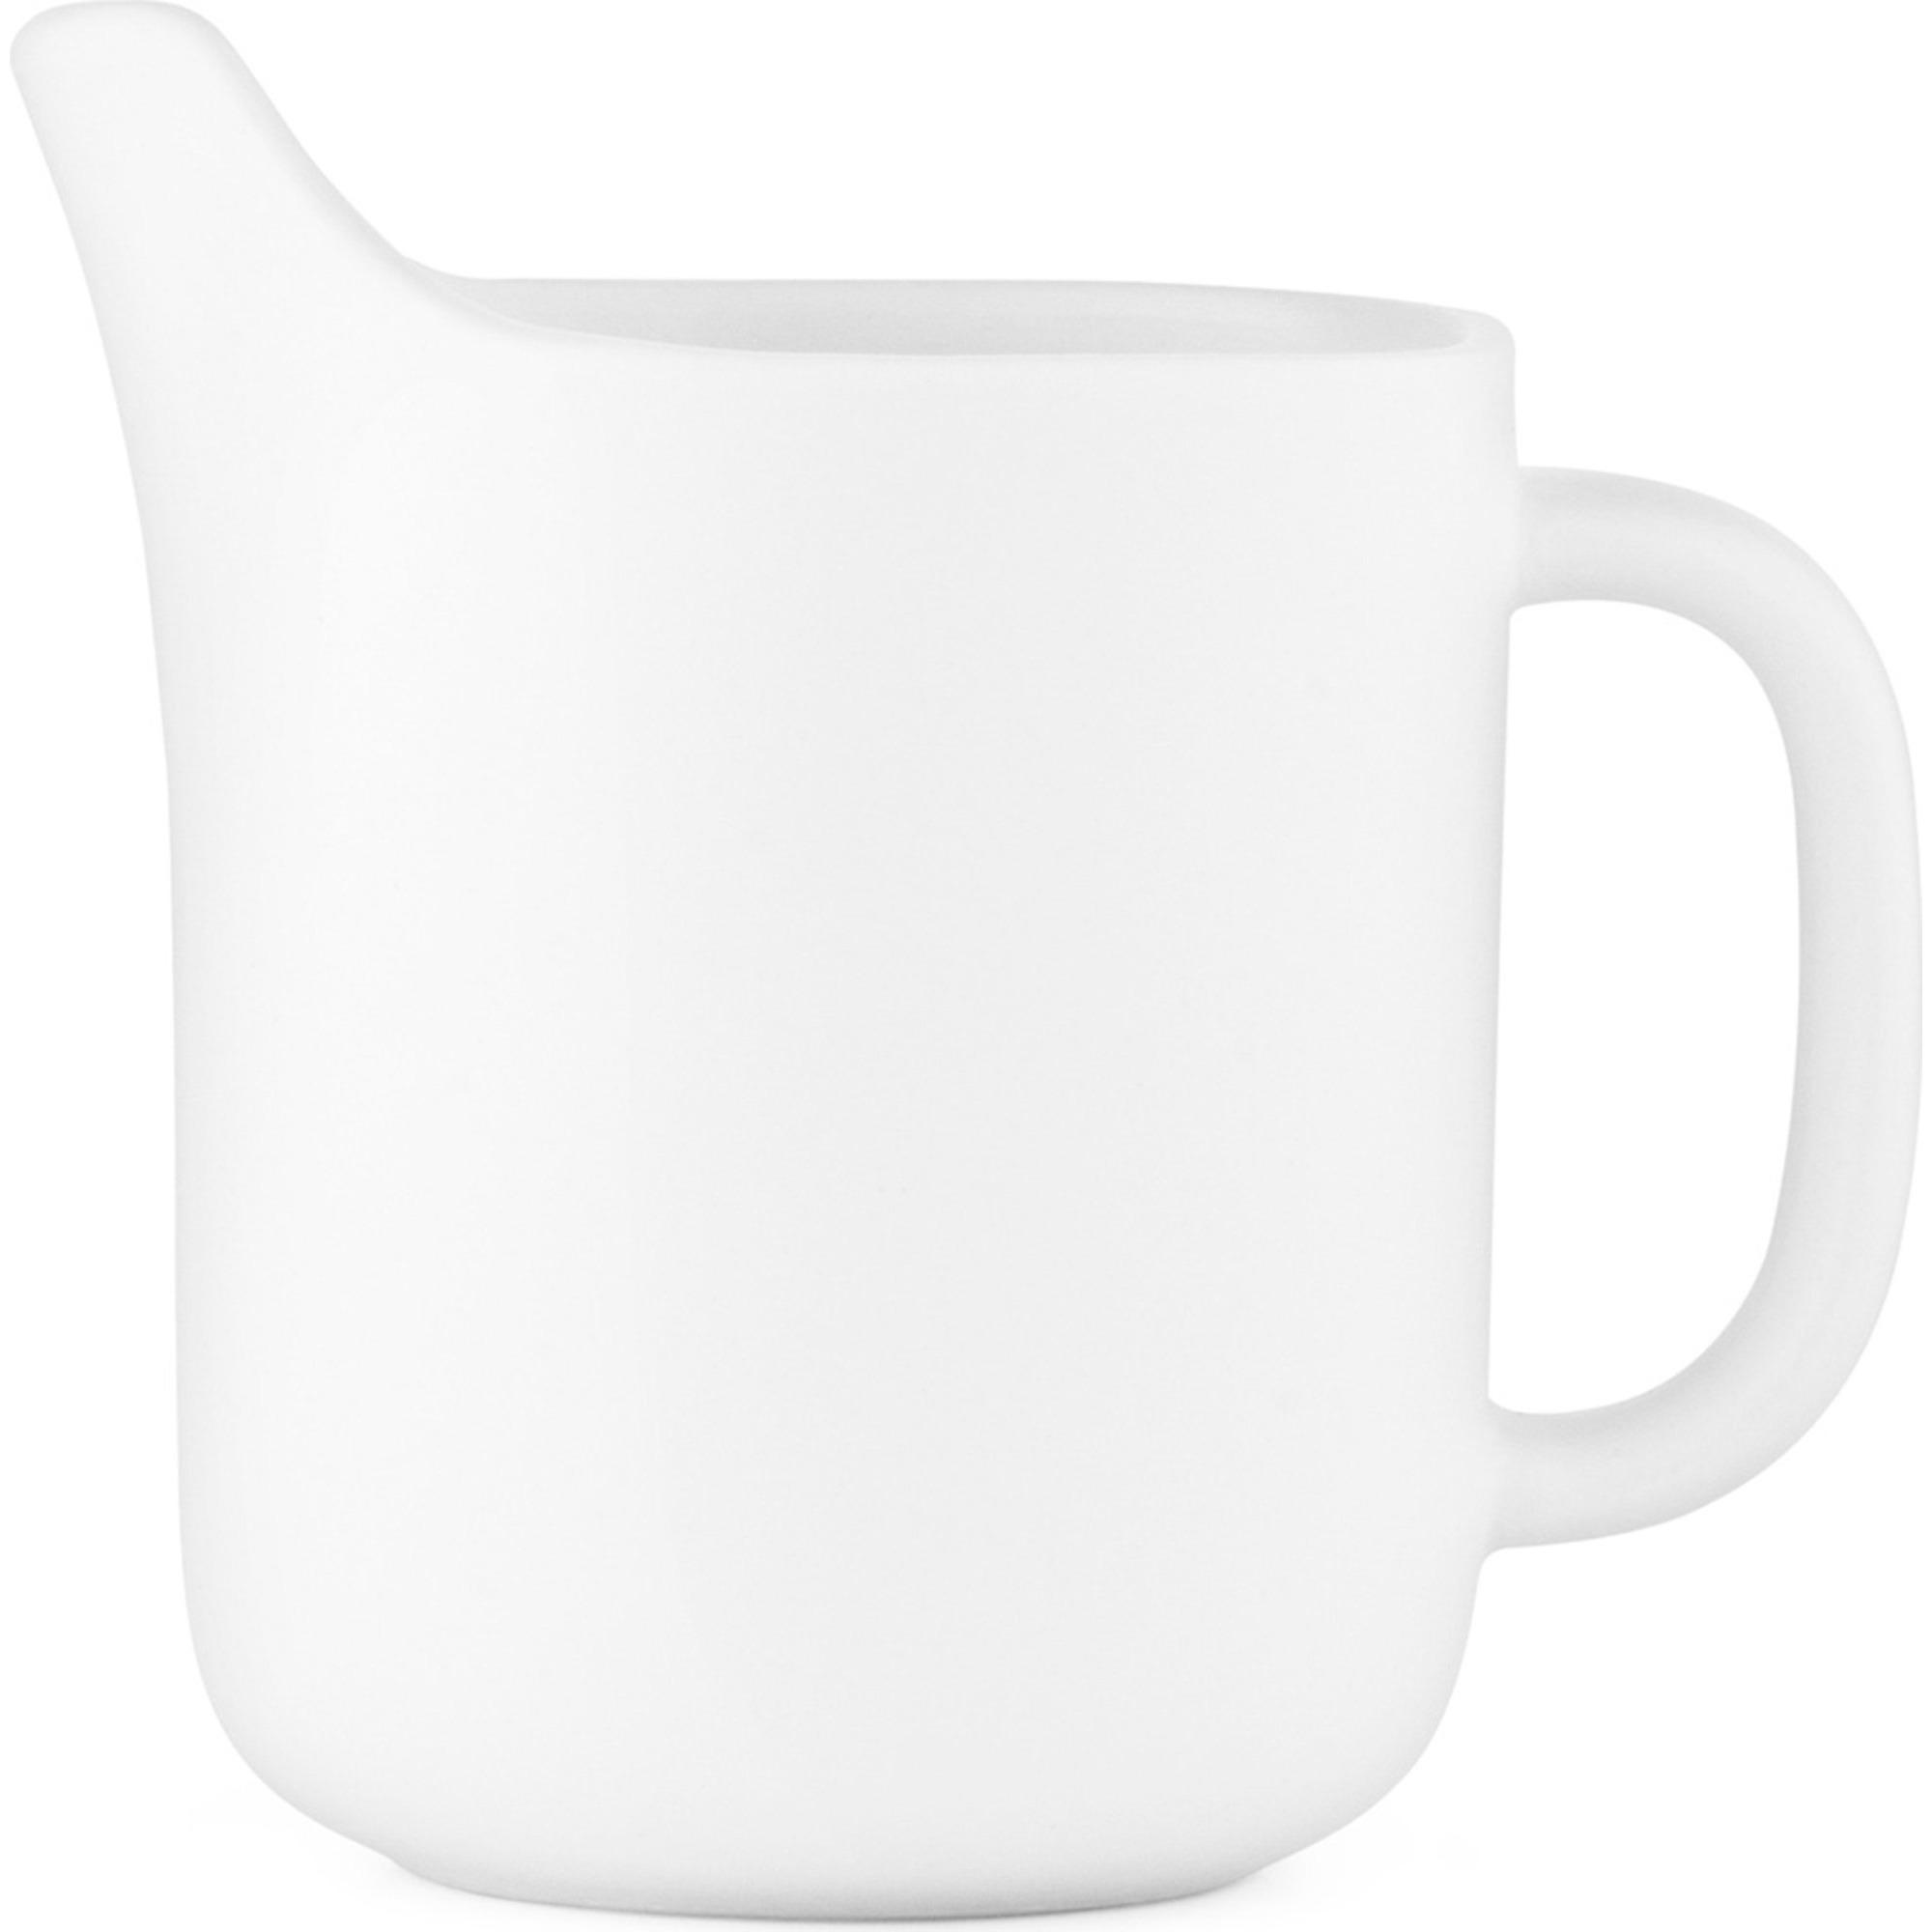 Normann Copenhagen Bliss Milk Jug 15 cl. White